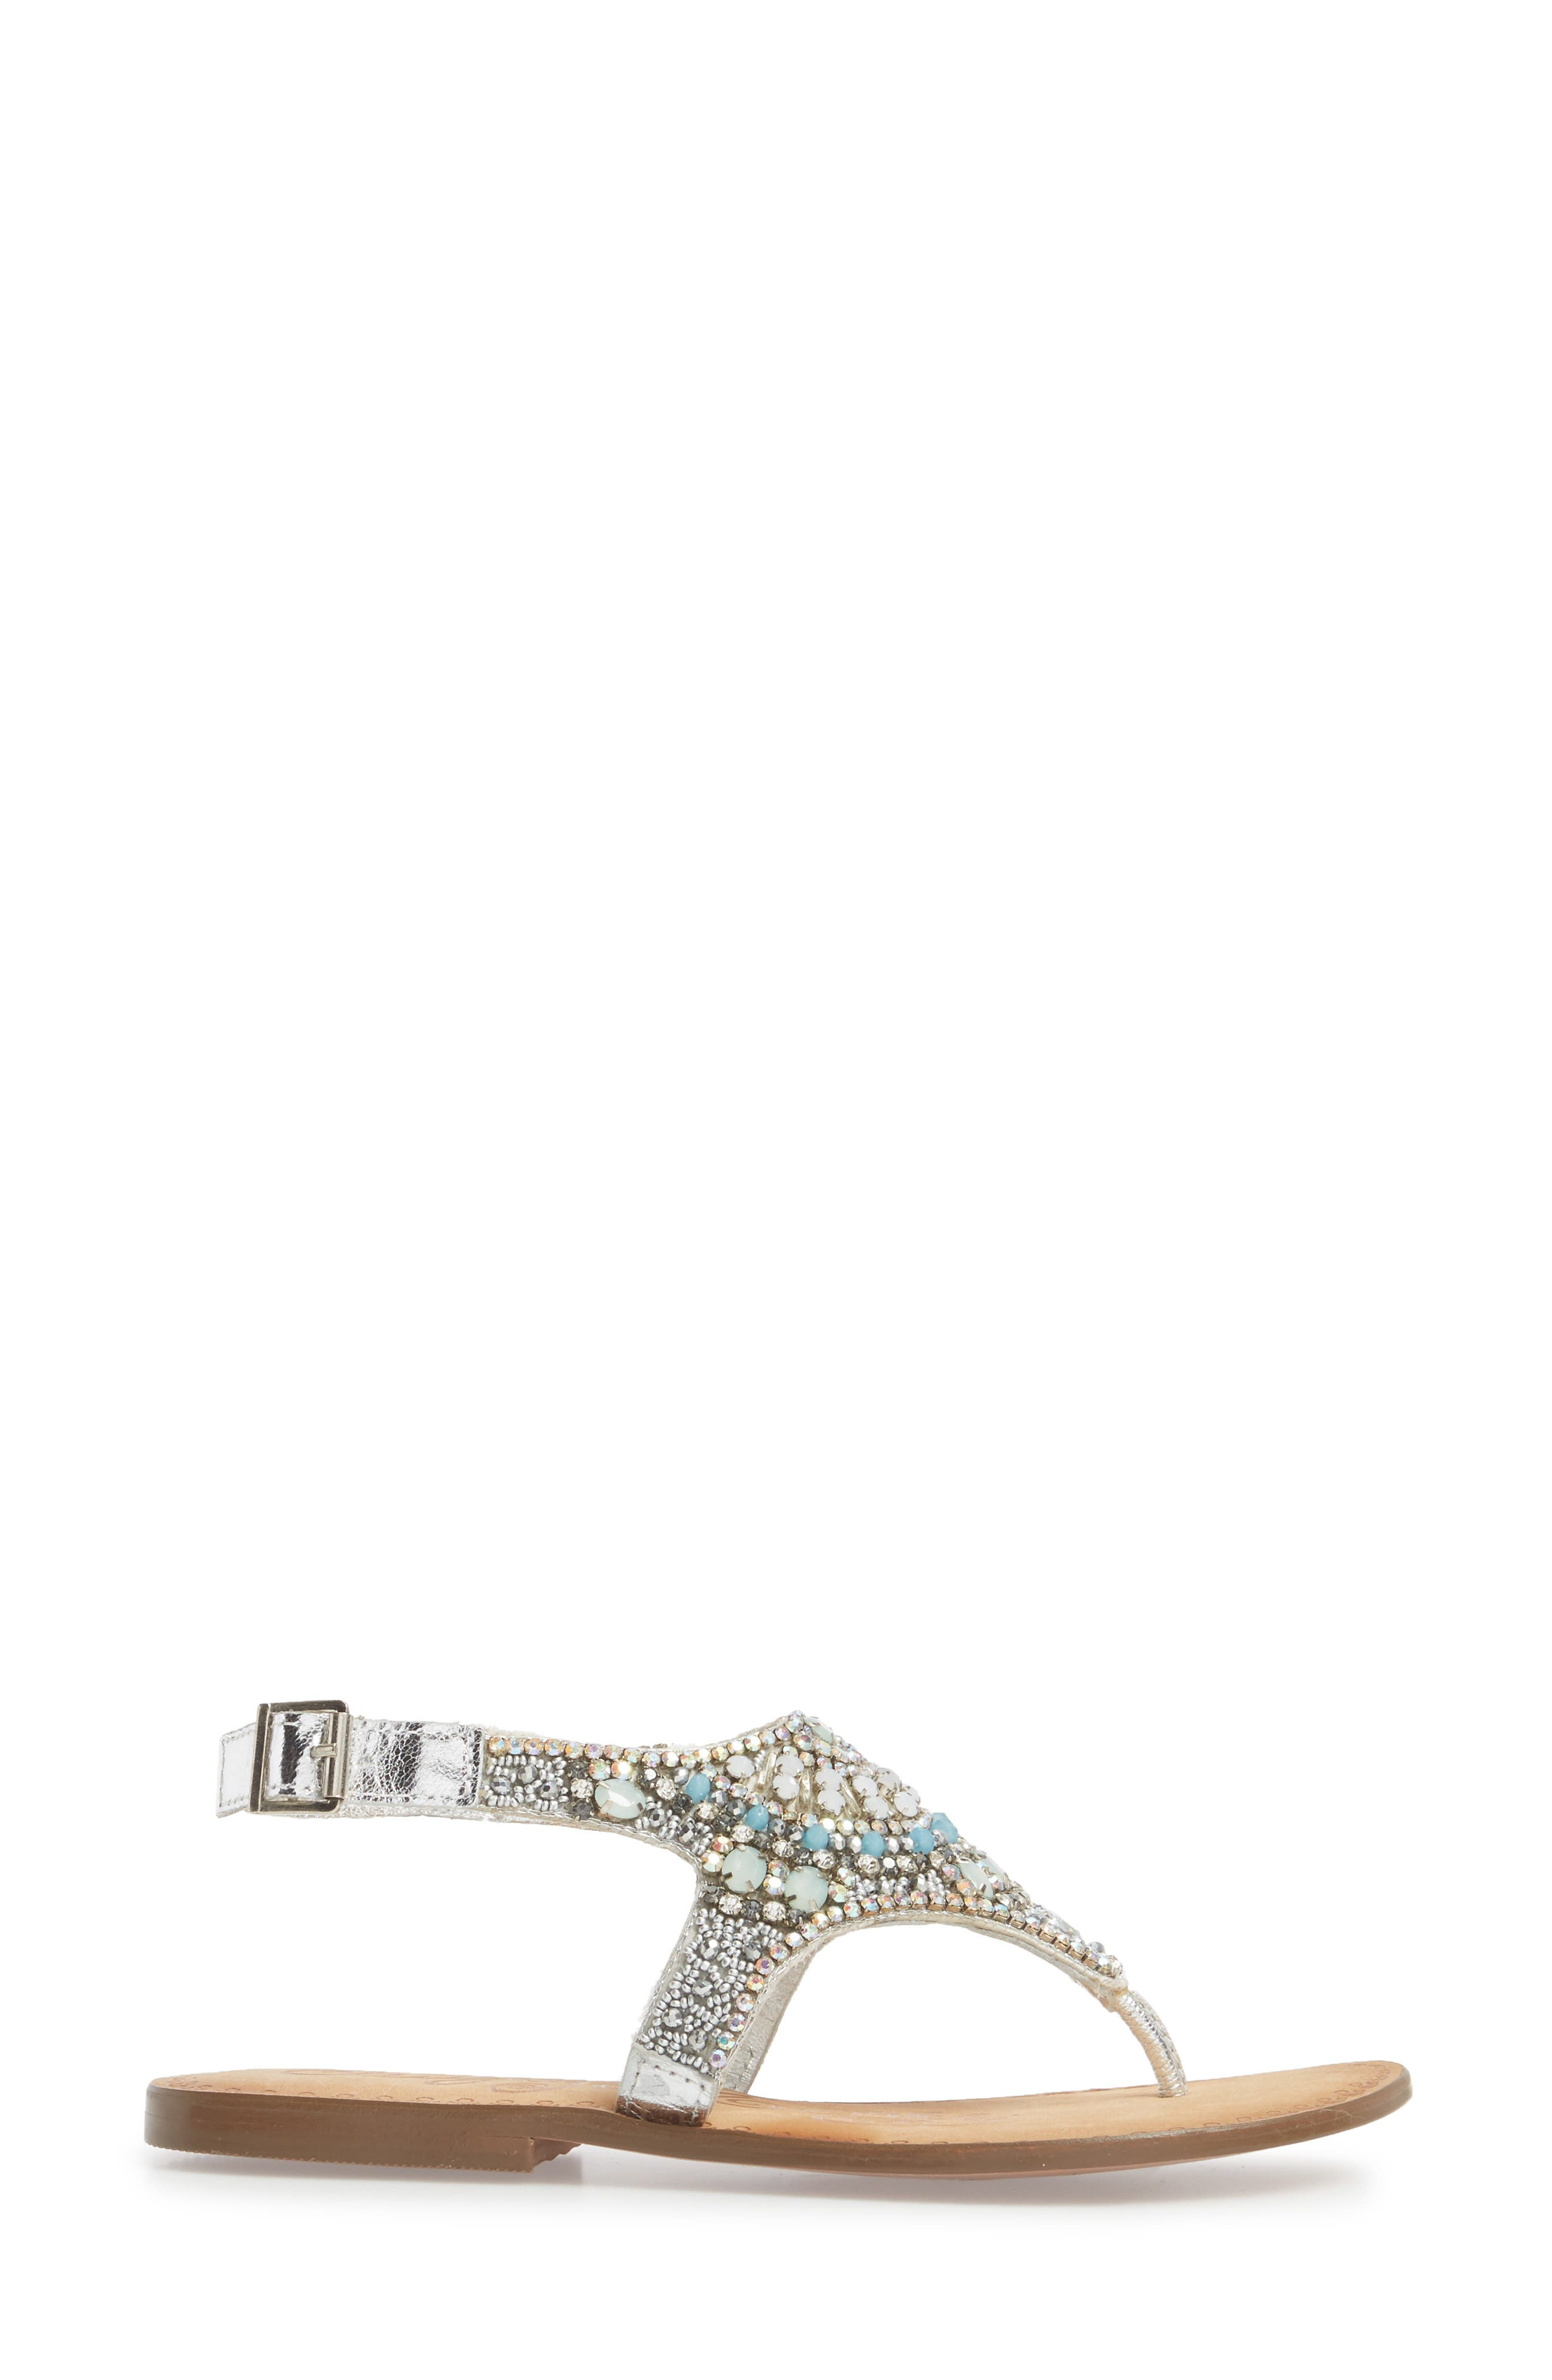 Iceberg Crystal Embellished Sandal,                             Alternate thumbnail 3, color,                             040